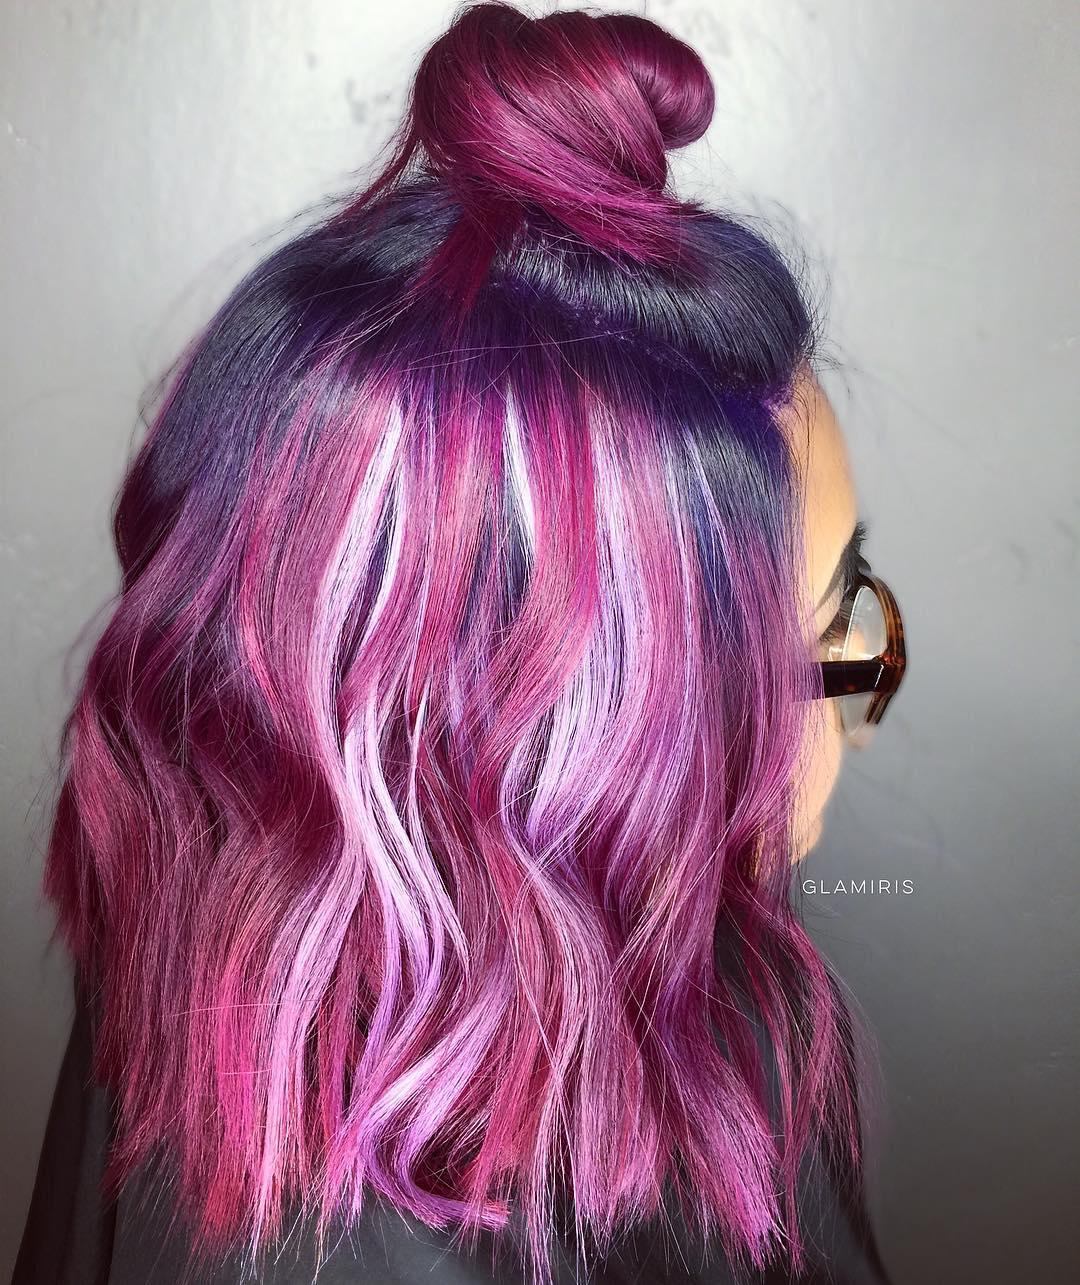 40 Versatile Ideas Of Purple Highlights For Blonde, Brown